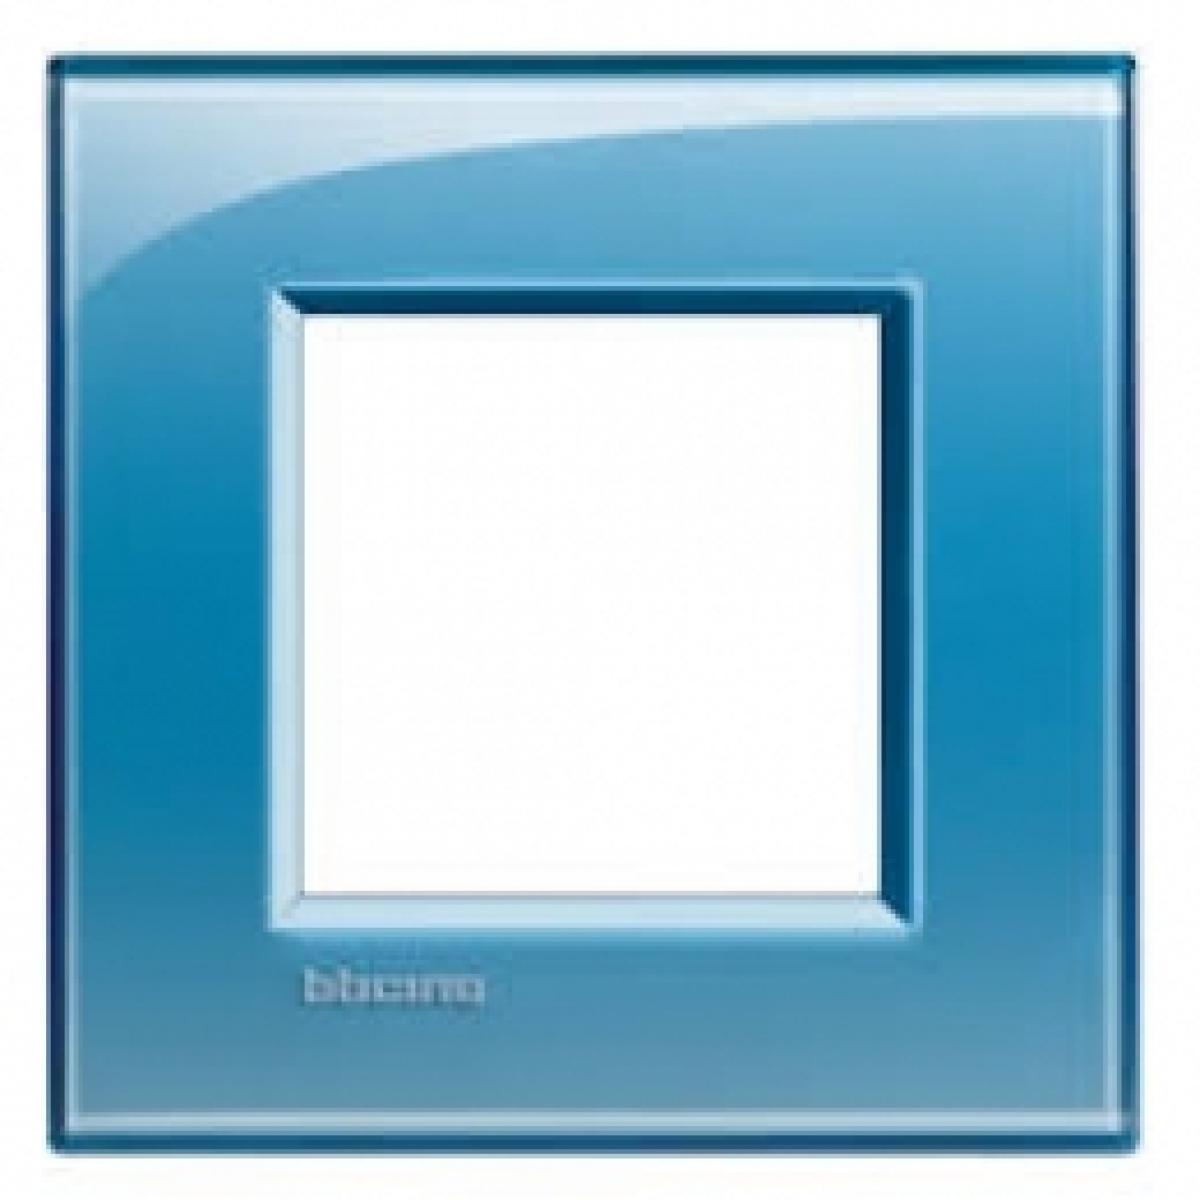 Placca 2 Moduli Azzurro Deep Bticino Living International LNA4802AD